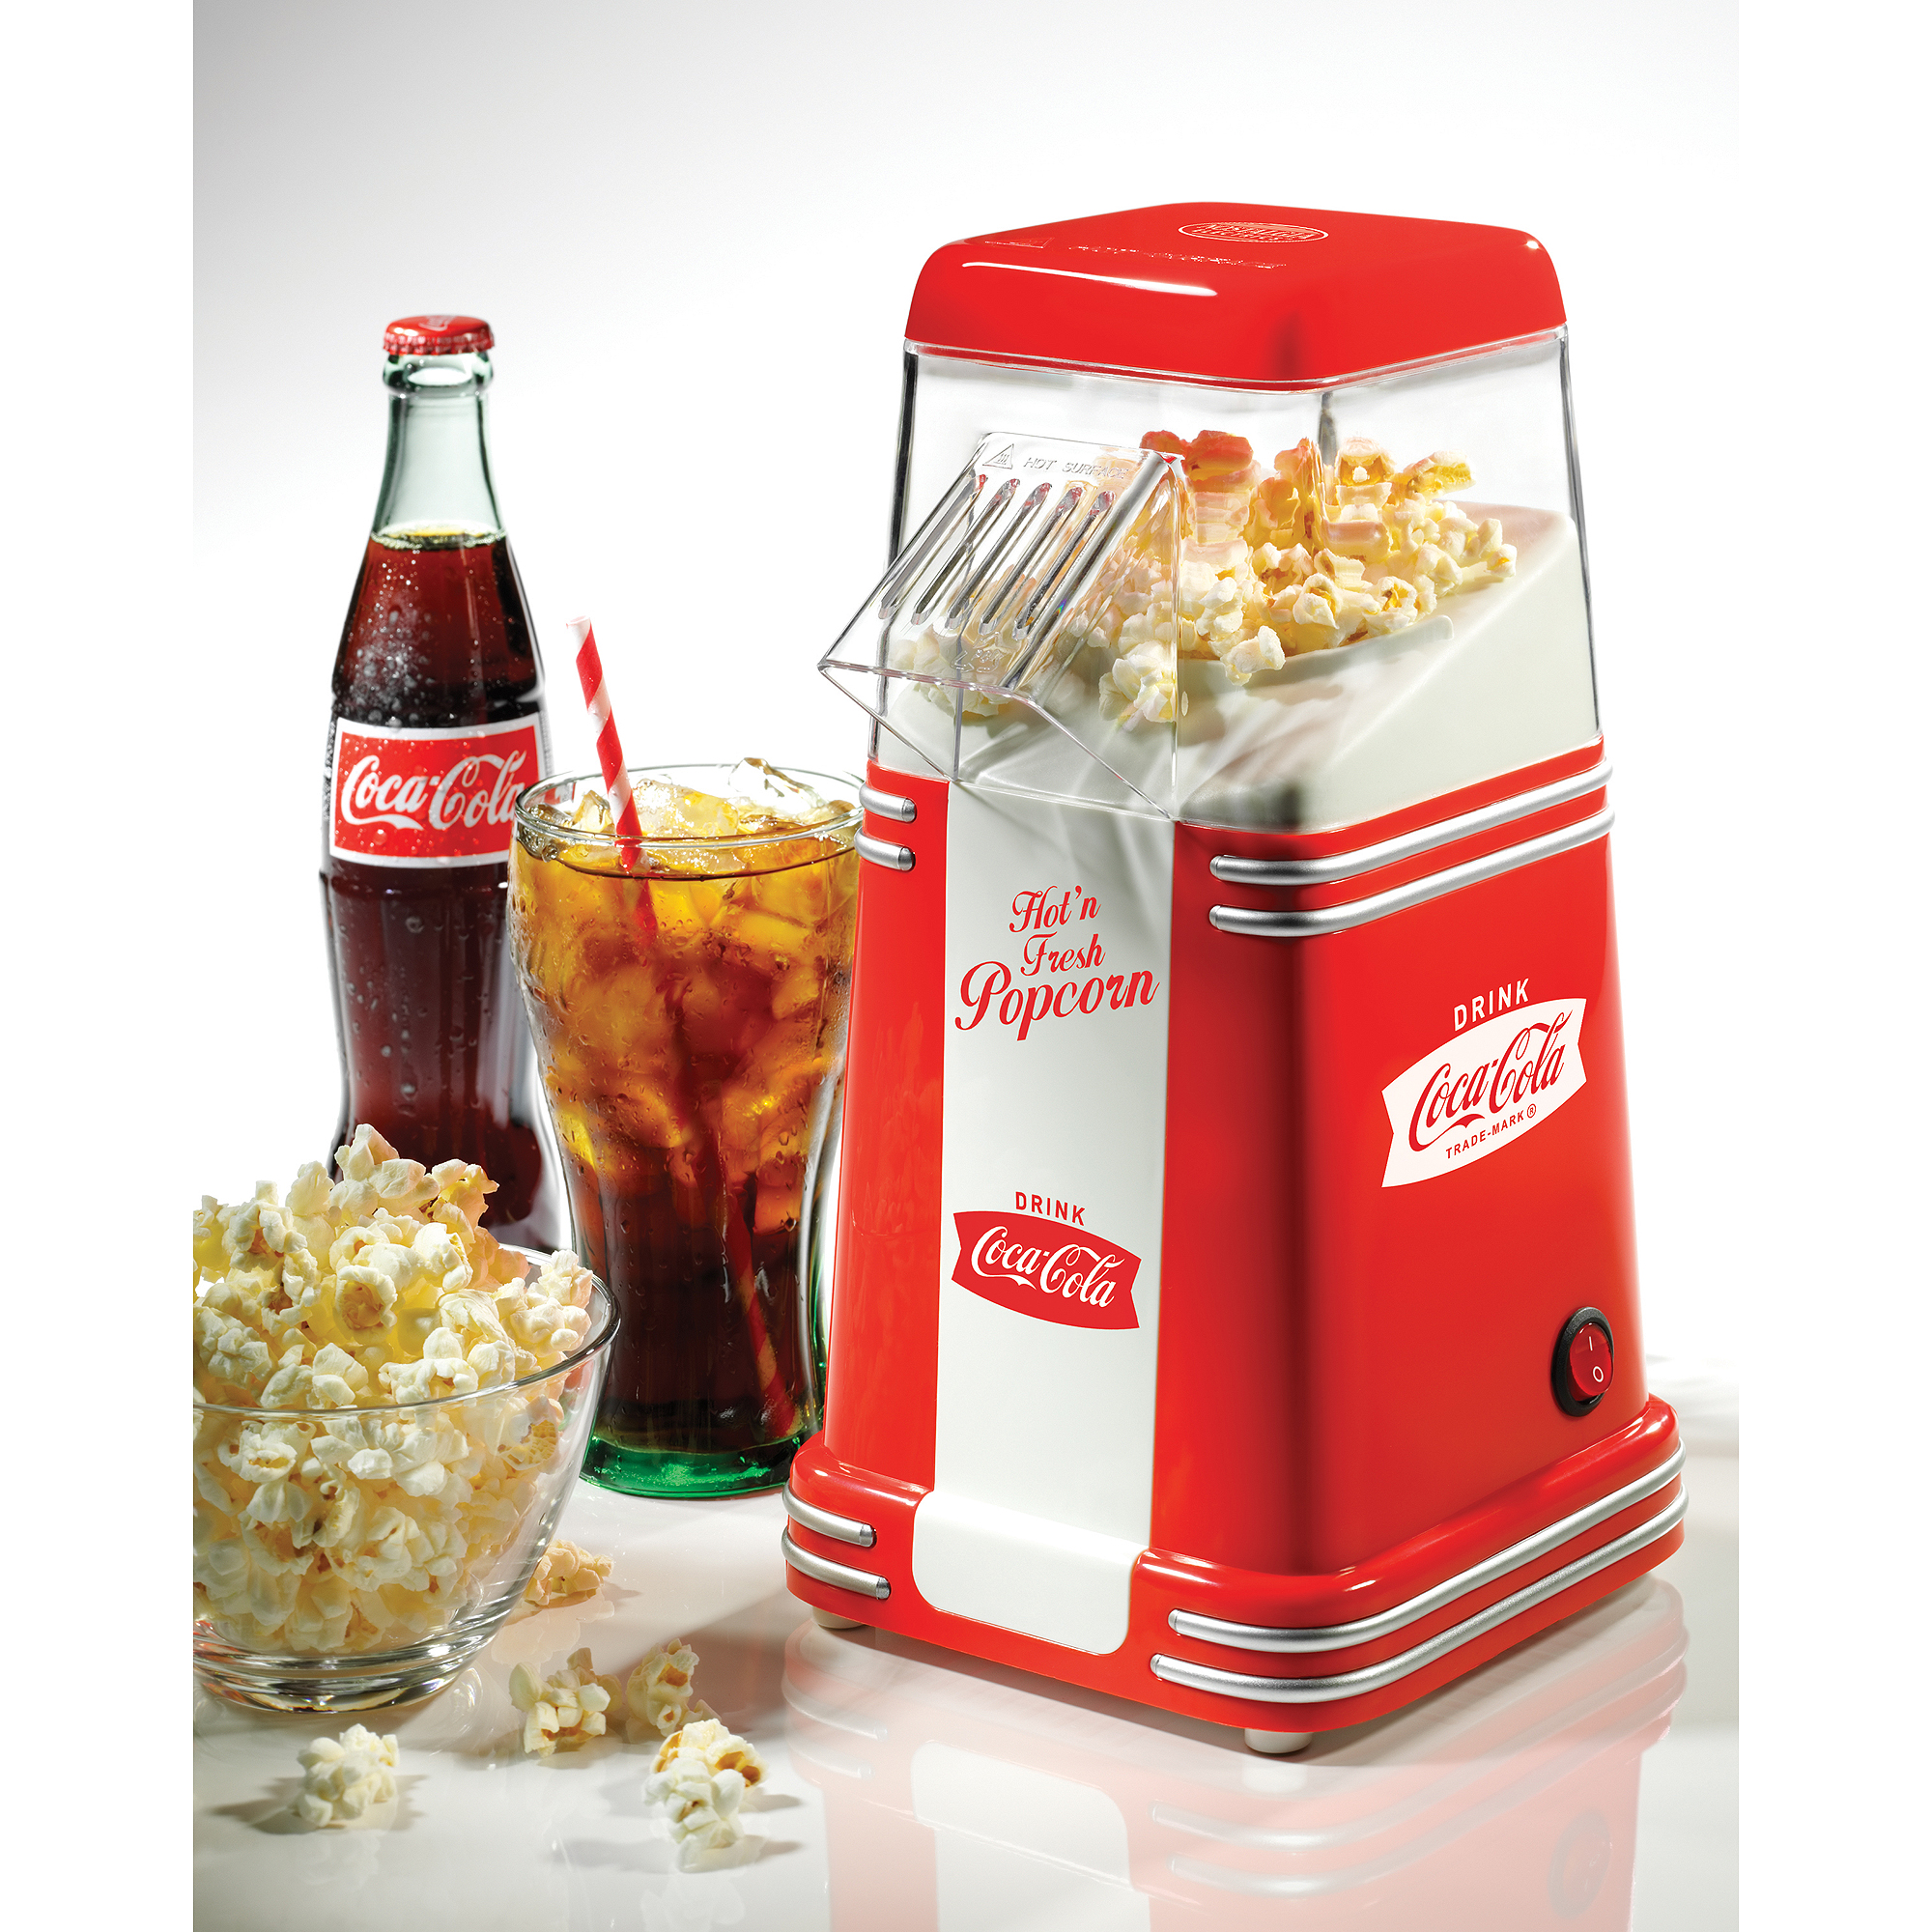 Mikamax popcorn maker